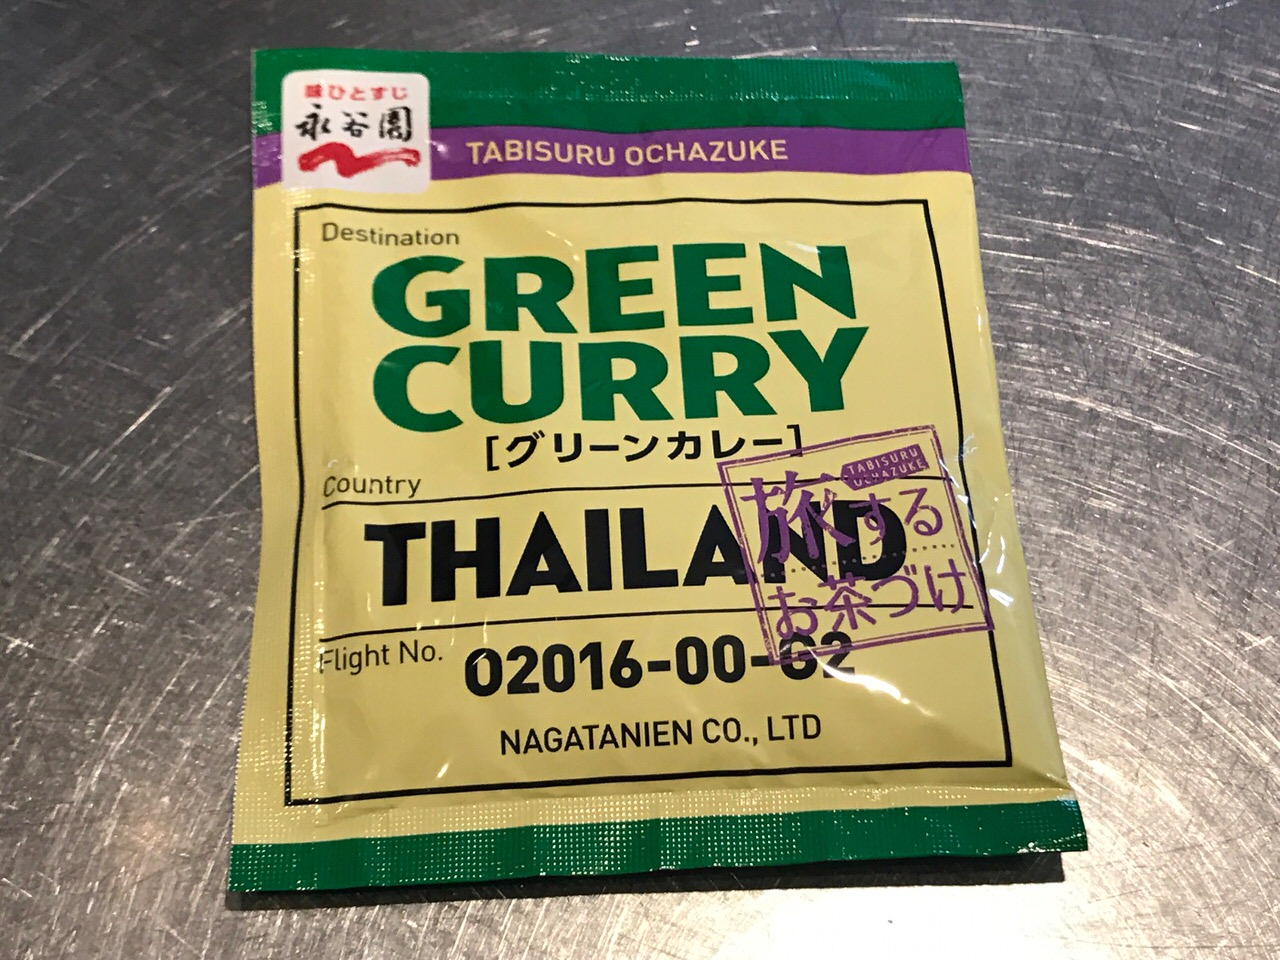 Travel thai ohcazuke 8482